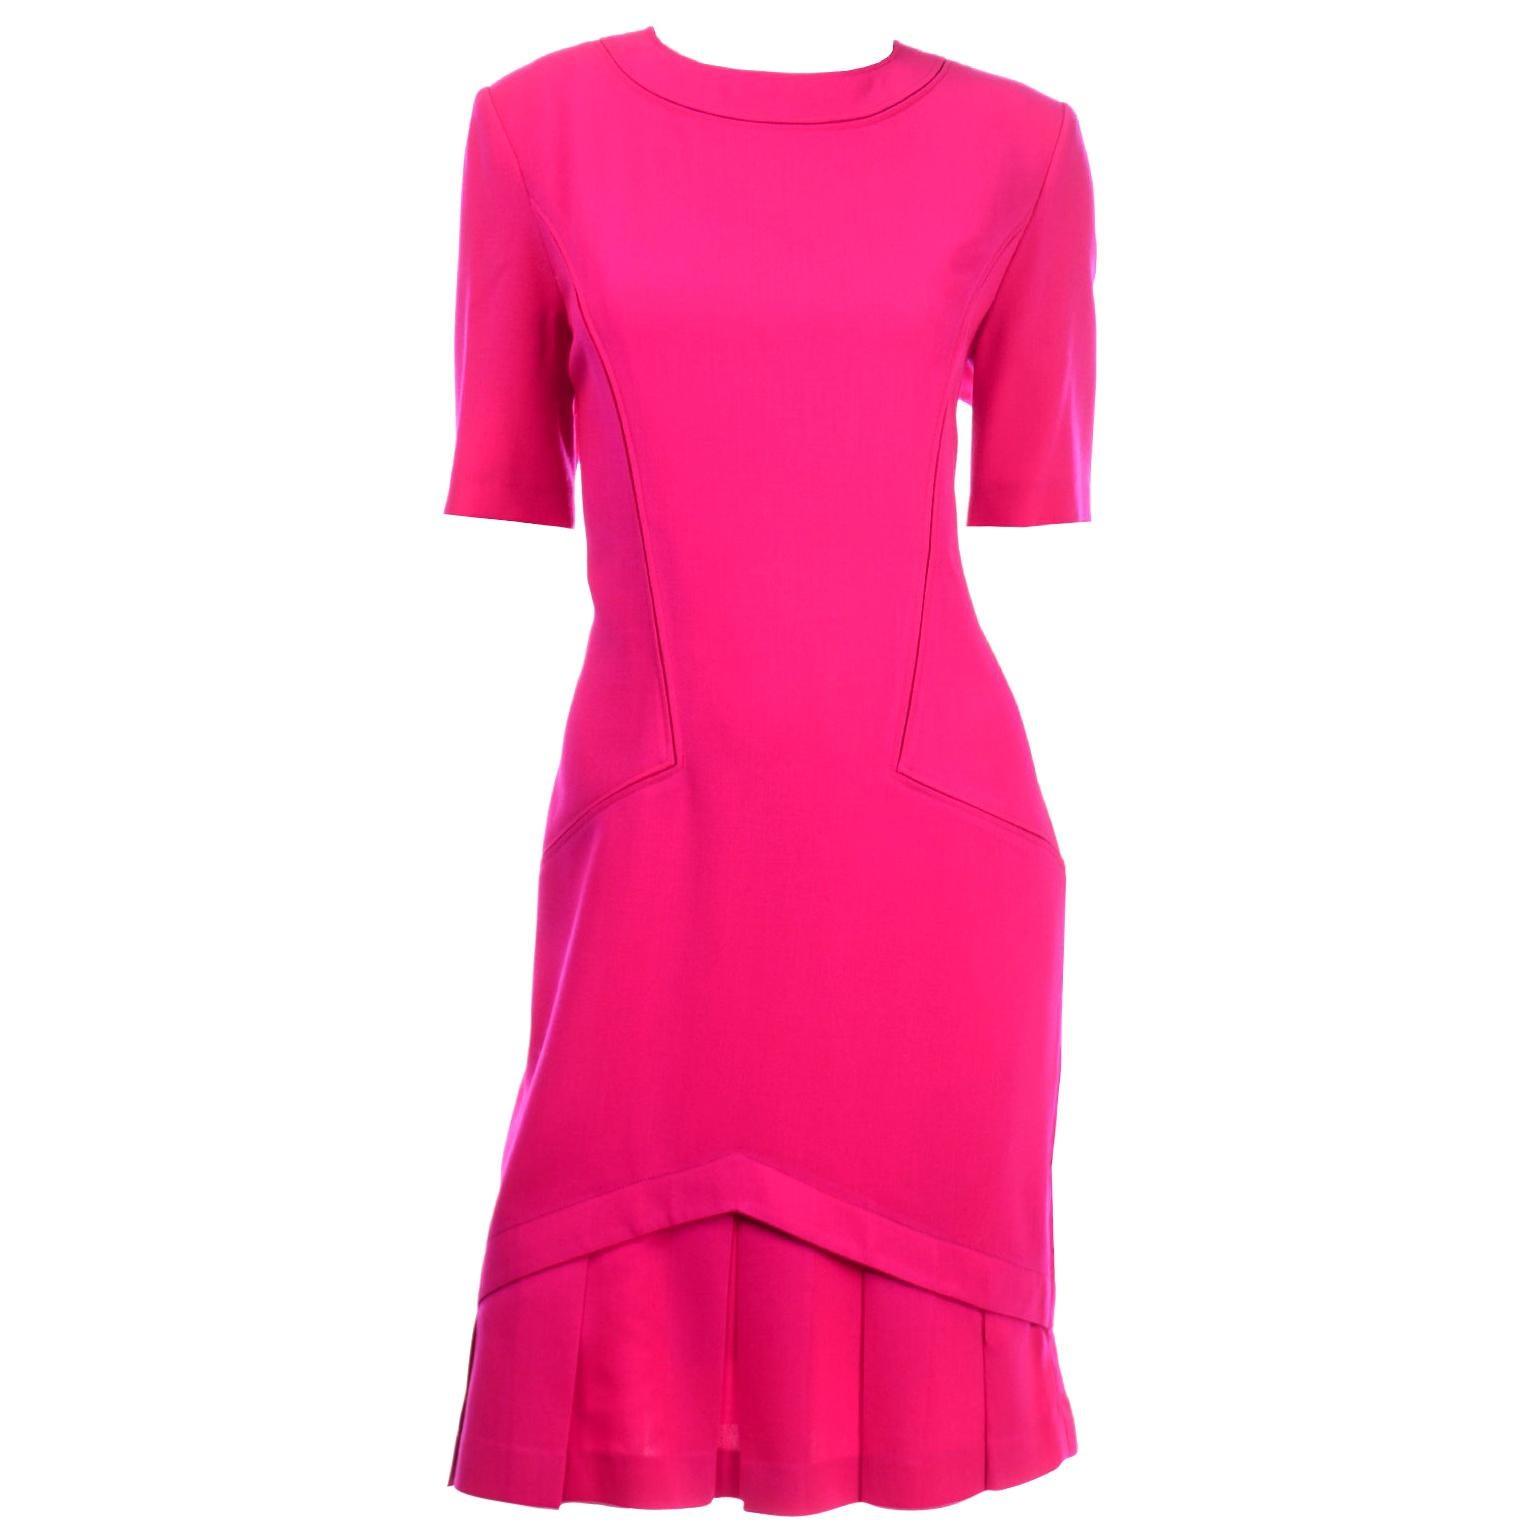 Vintage Louis Feraud Vintage Bright Hot Pink Short Sleeve Spring Summer Dress